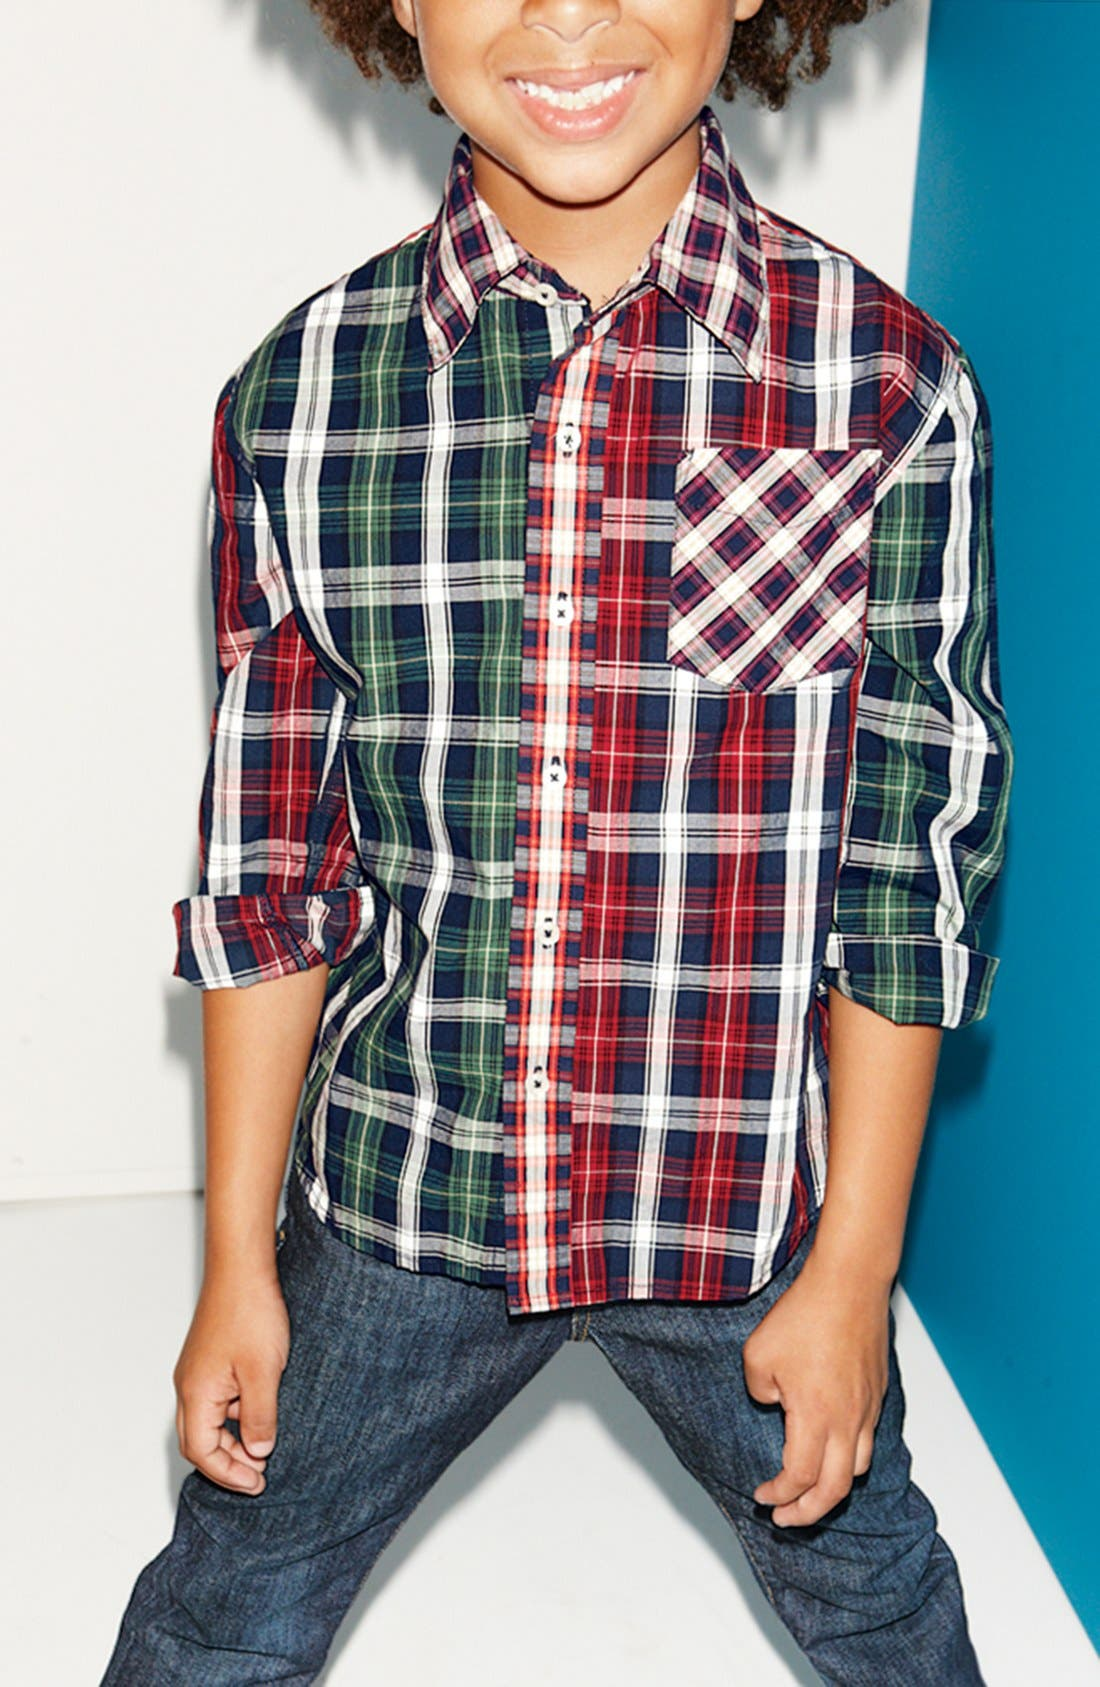 Alternate Image 1 Selected - Peek Woven Shirt & Jeans (Little Boys & Big Boys)